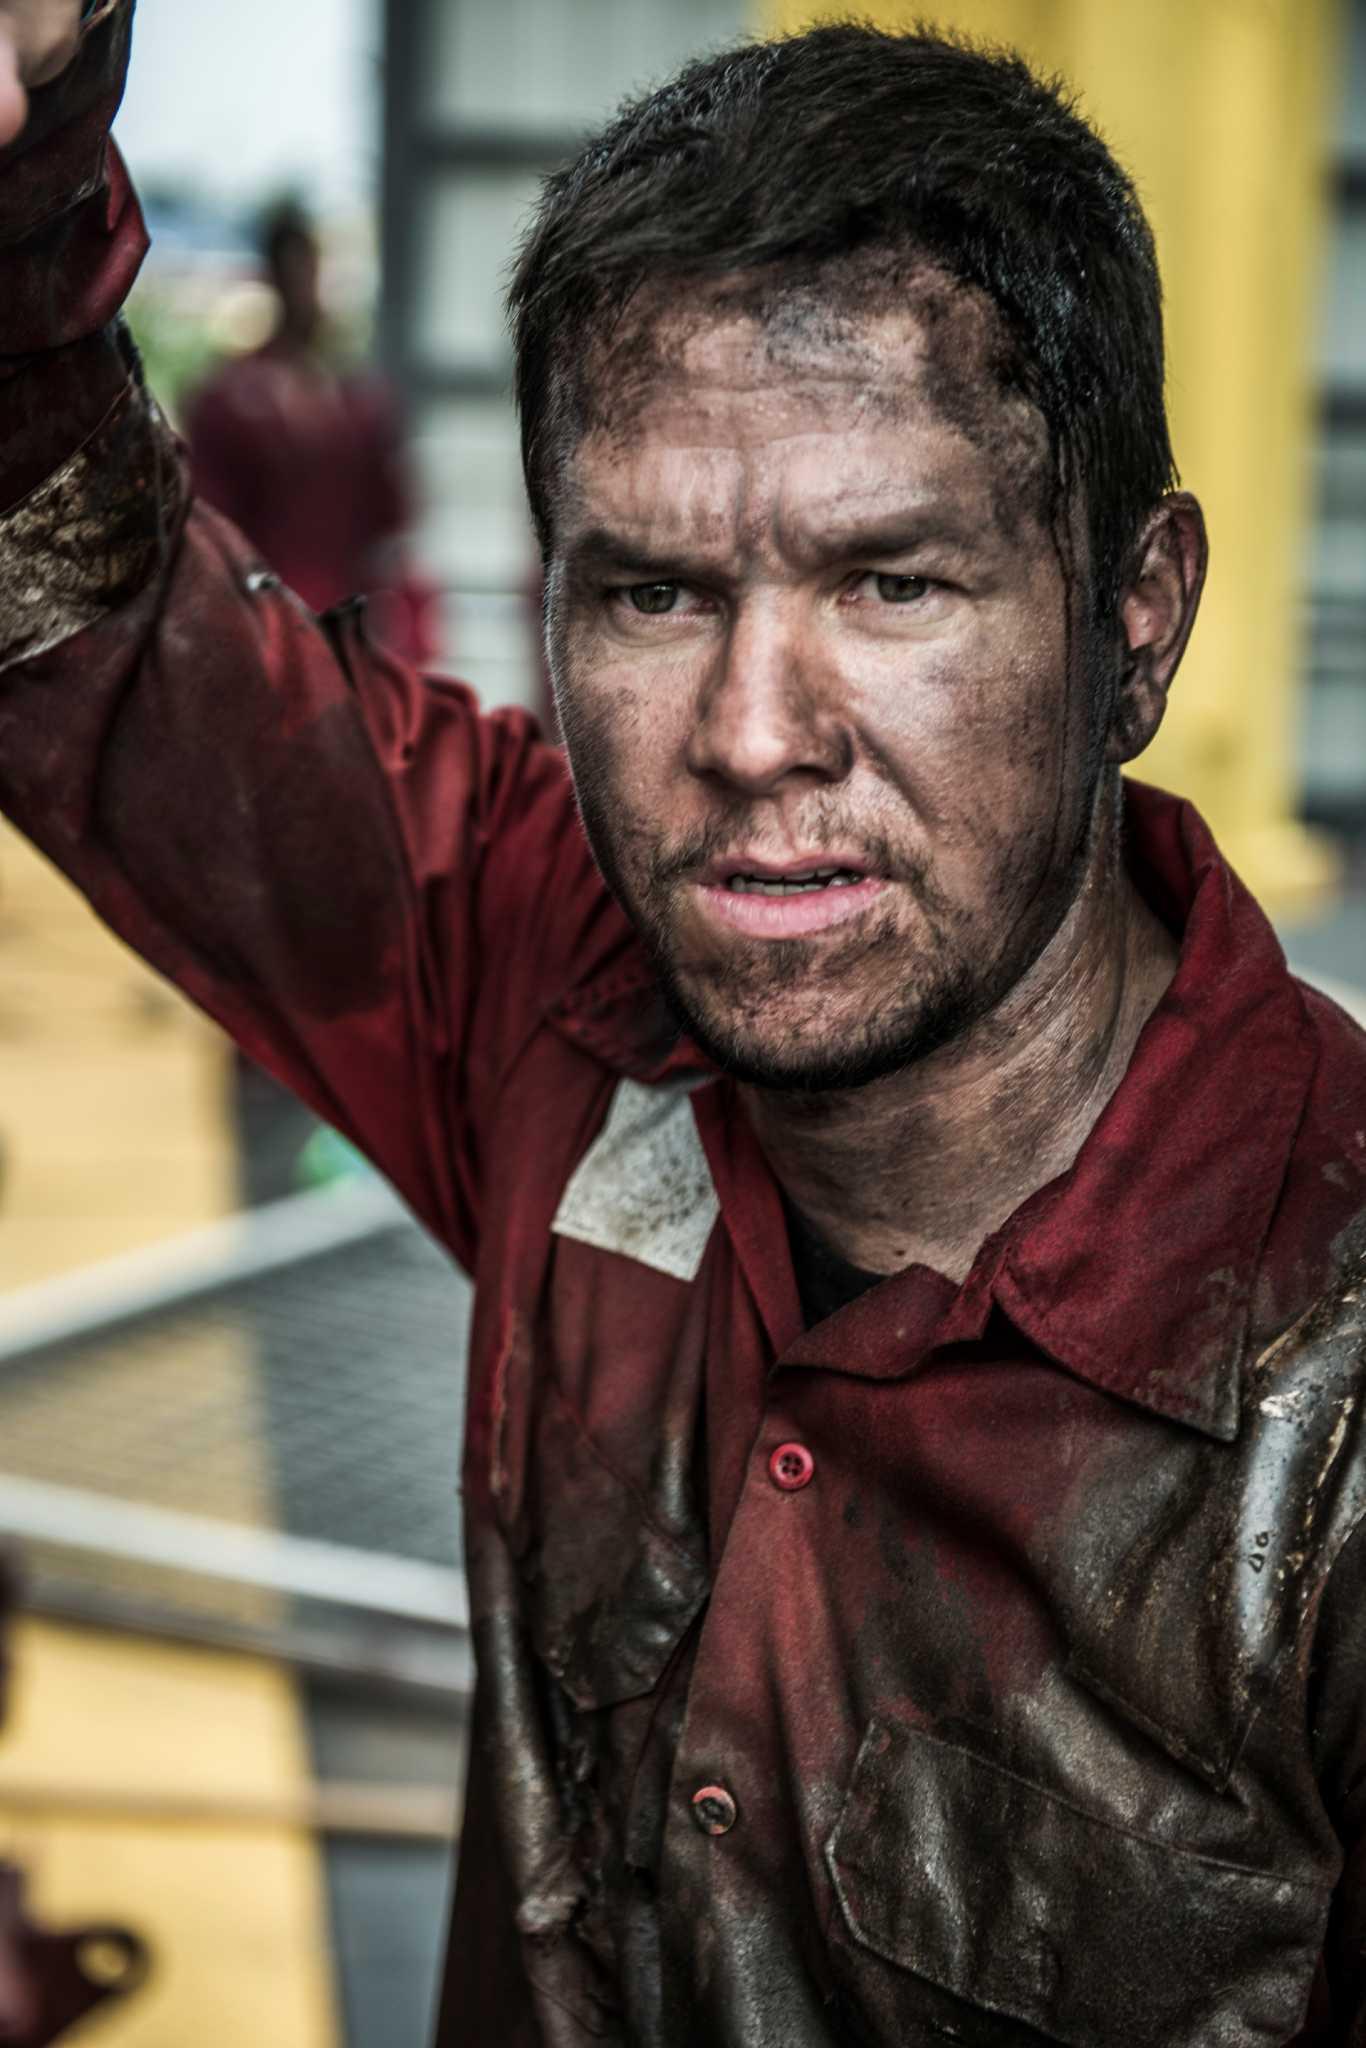 Deepwater Horizon survivors give new film mixed reviews